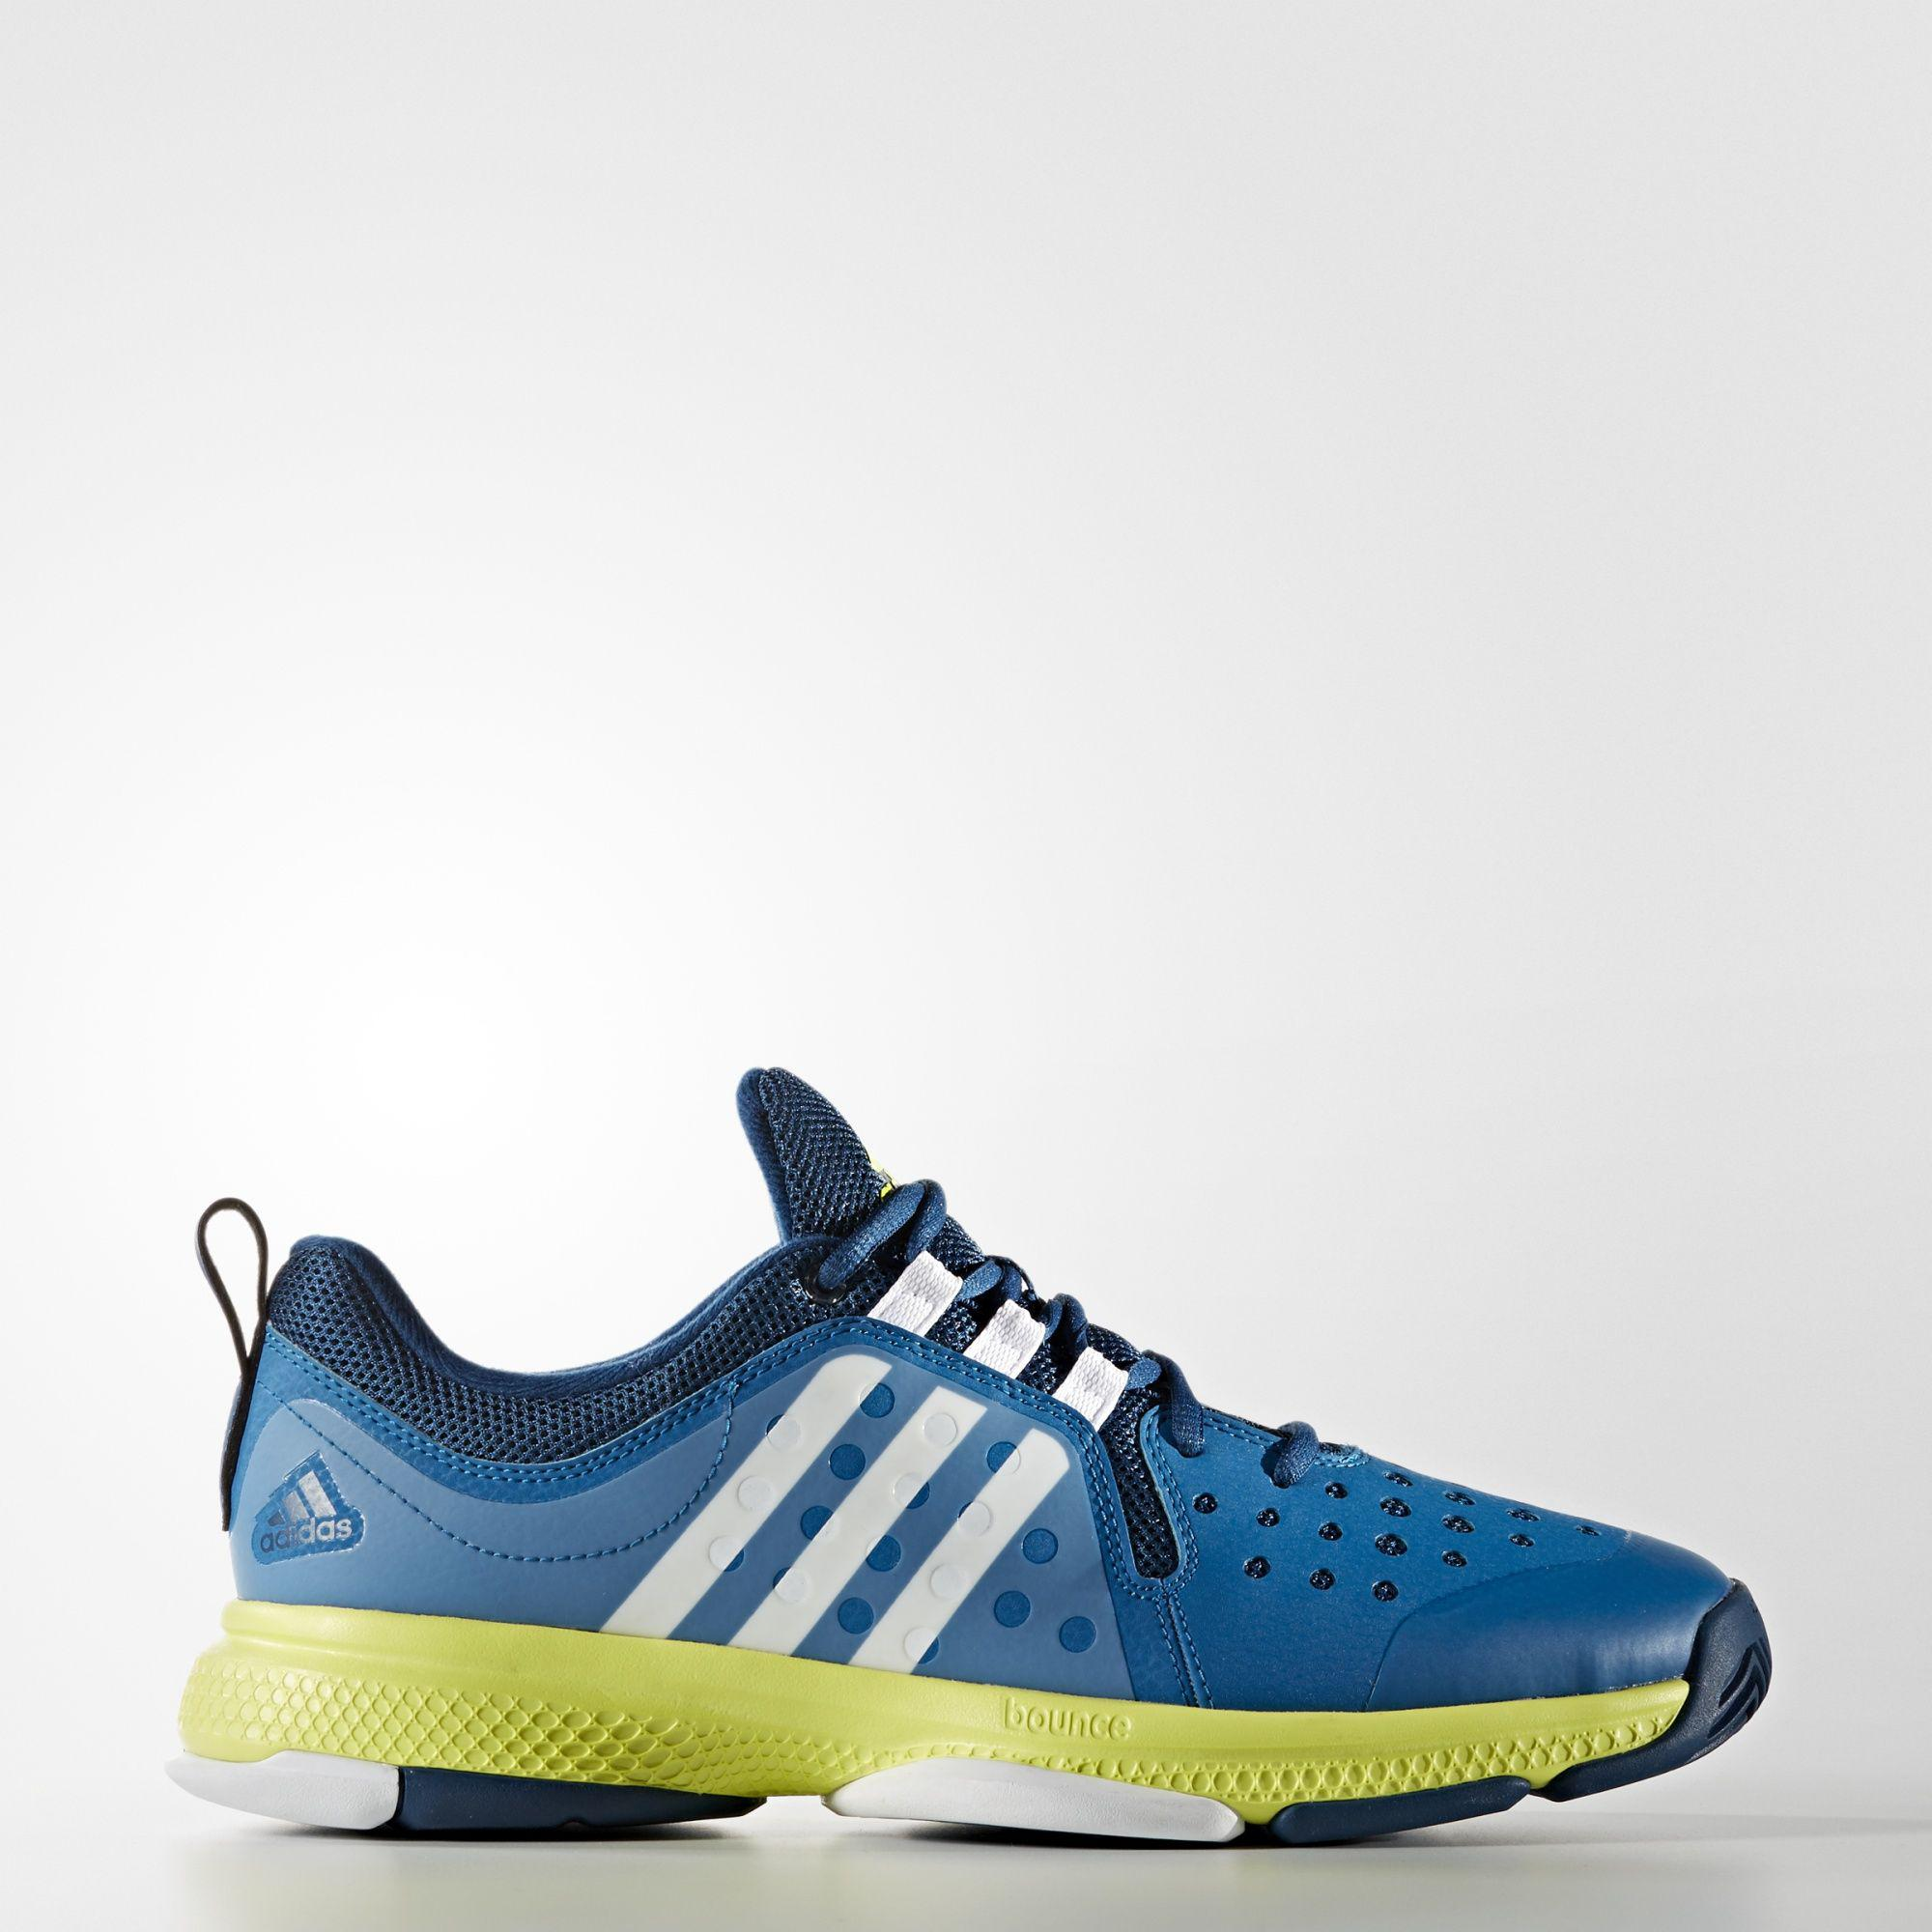 low cost a4f92 67f11 Adidas Mens Barricade Classic Bounce Tennis Shoes - BlueGreen -  Tennisnuts.com